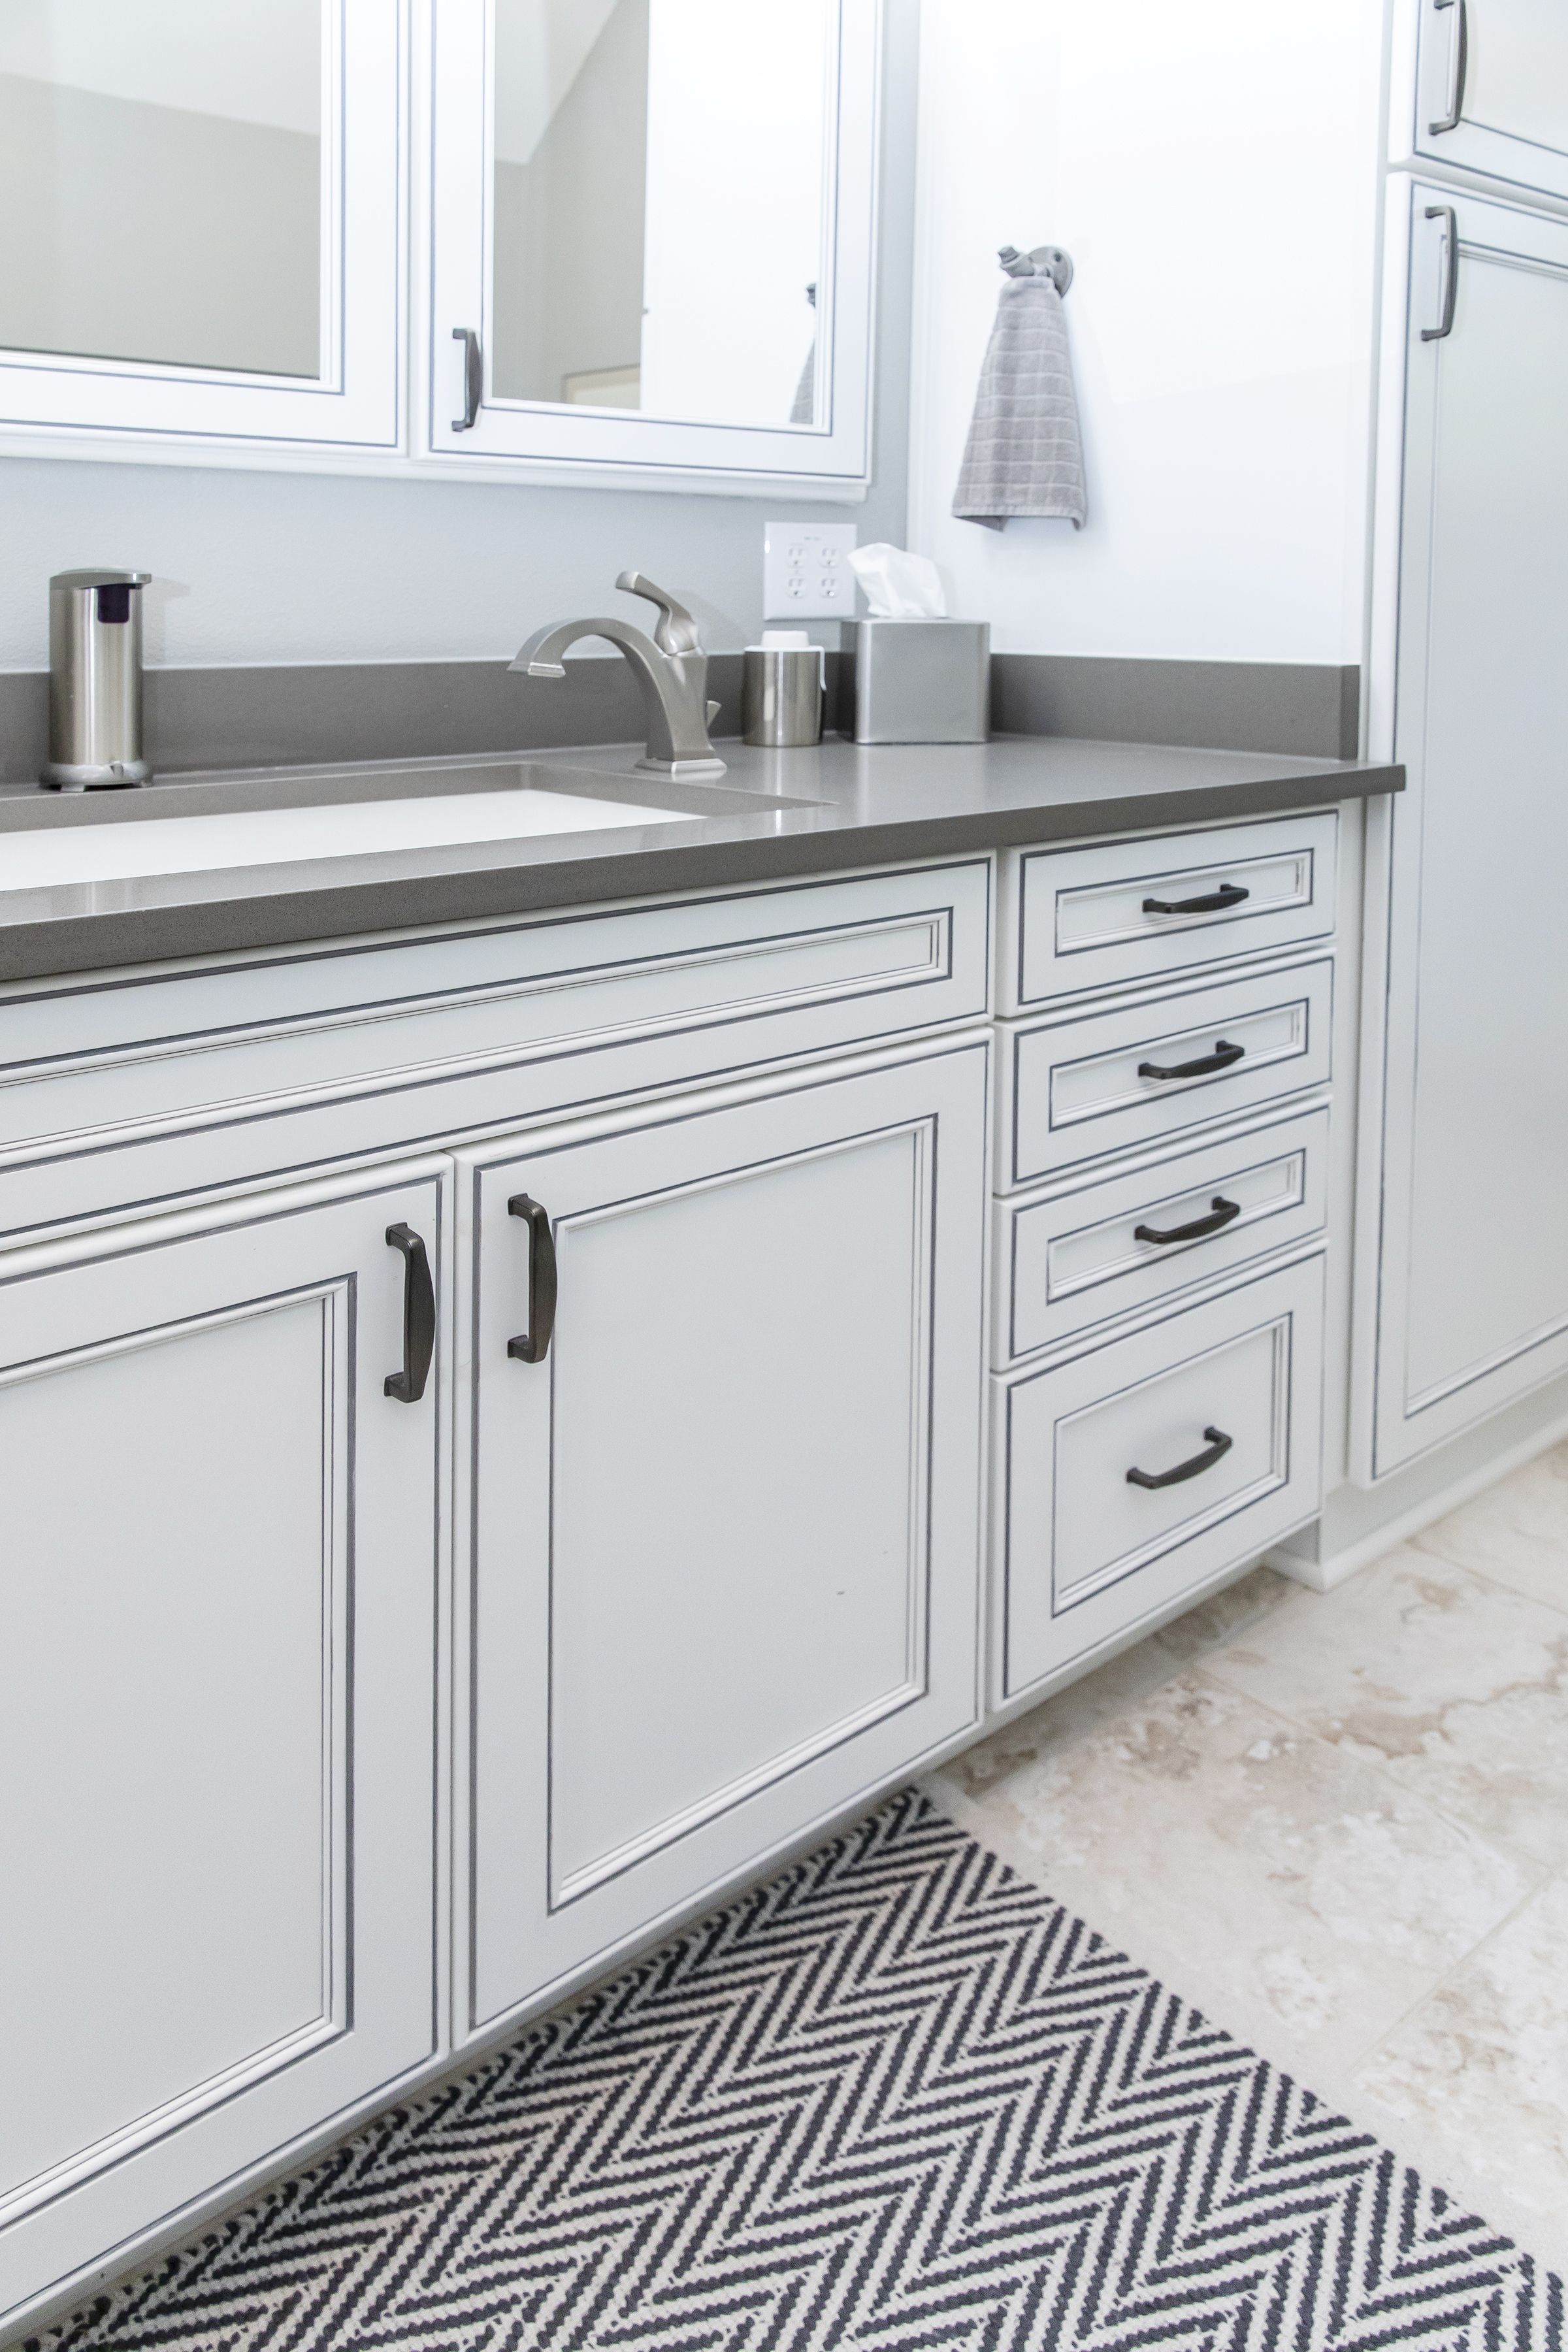 Pinstripe Cabinets In Gray On White Kichen Cabinets Kitchen Cabinets Makeover Kitchen Upgrades